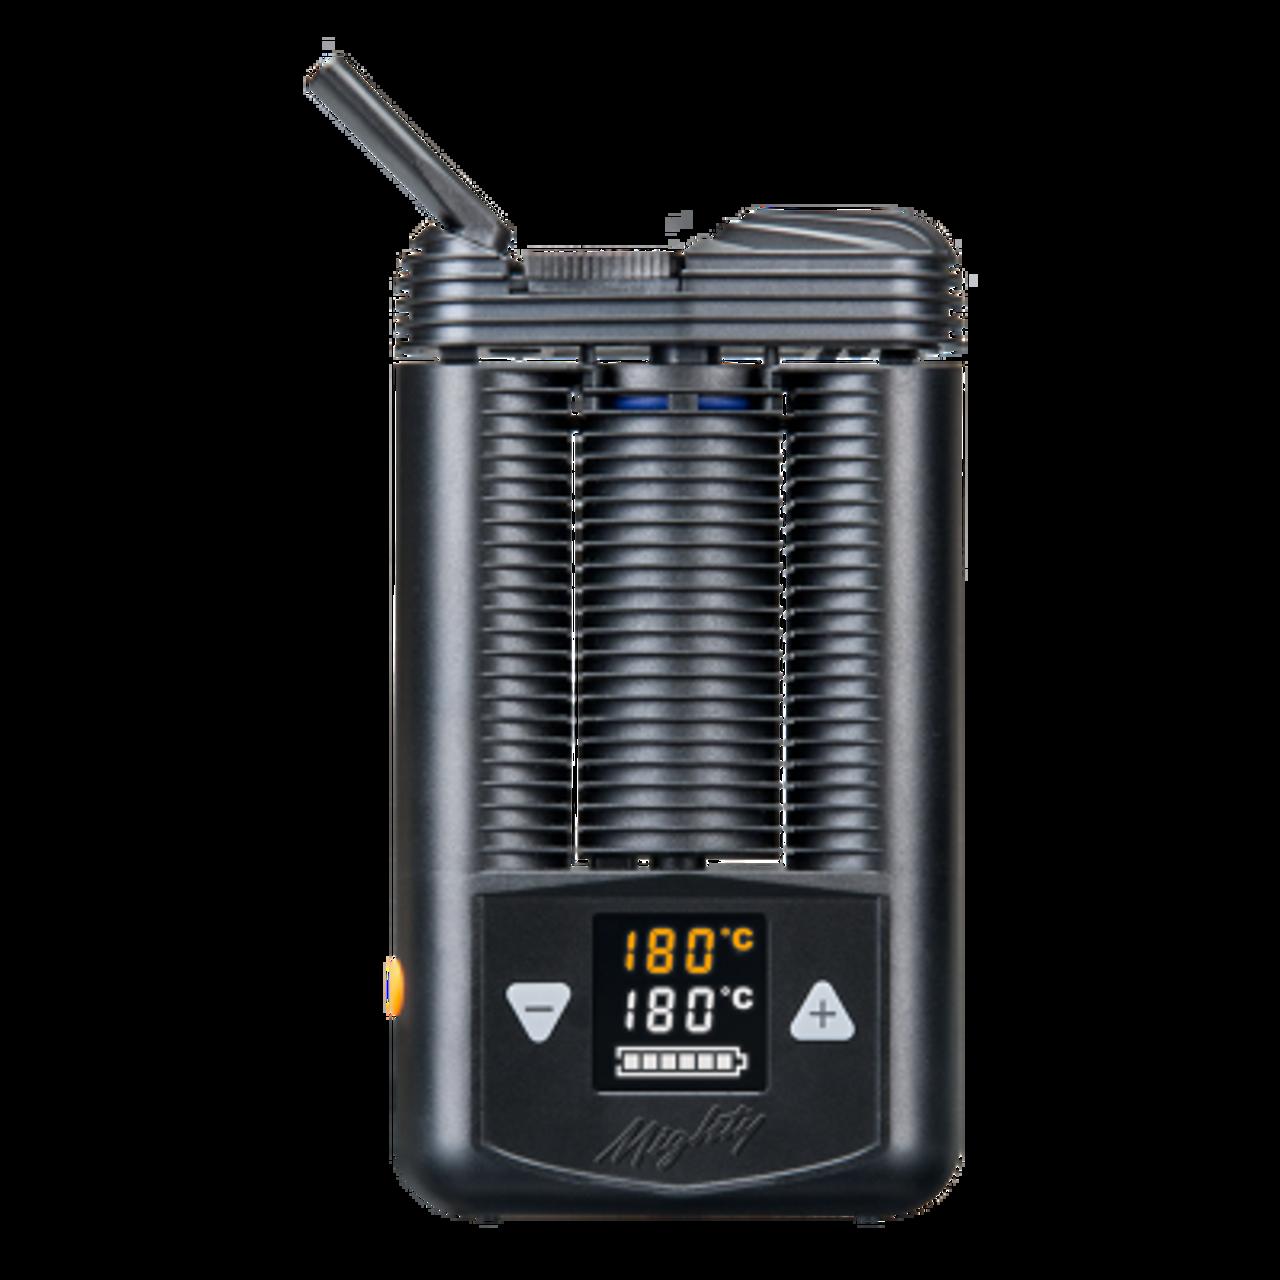 Mighty Vaporizer - Best Portable Herb Vaporizer